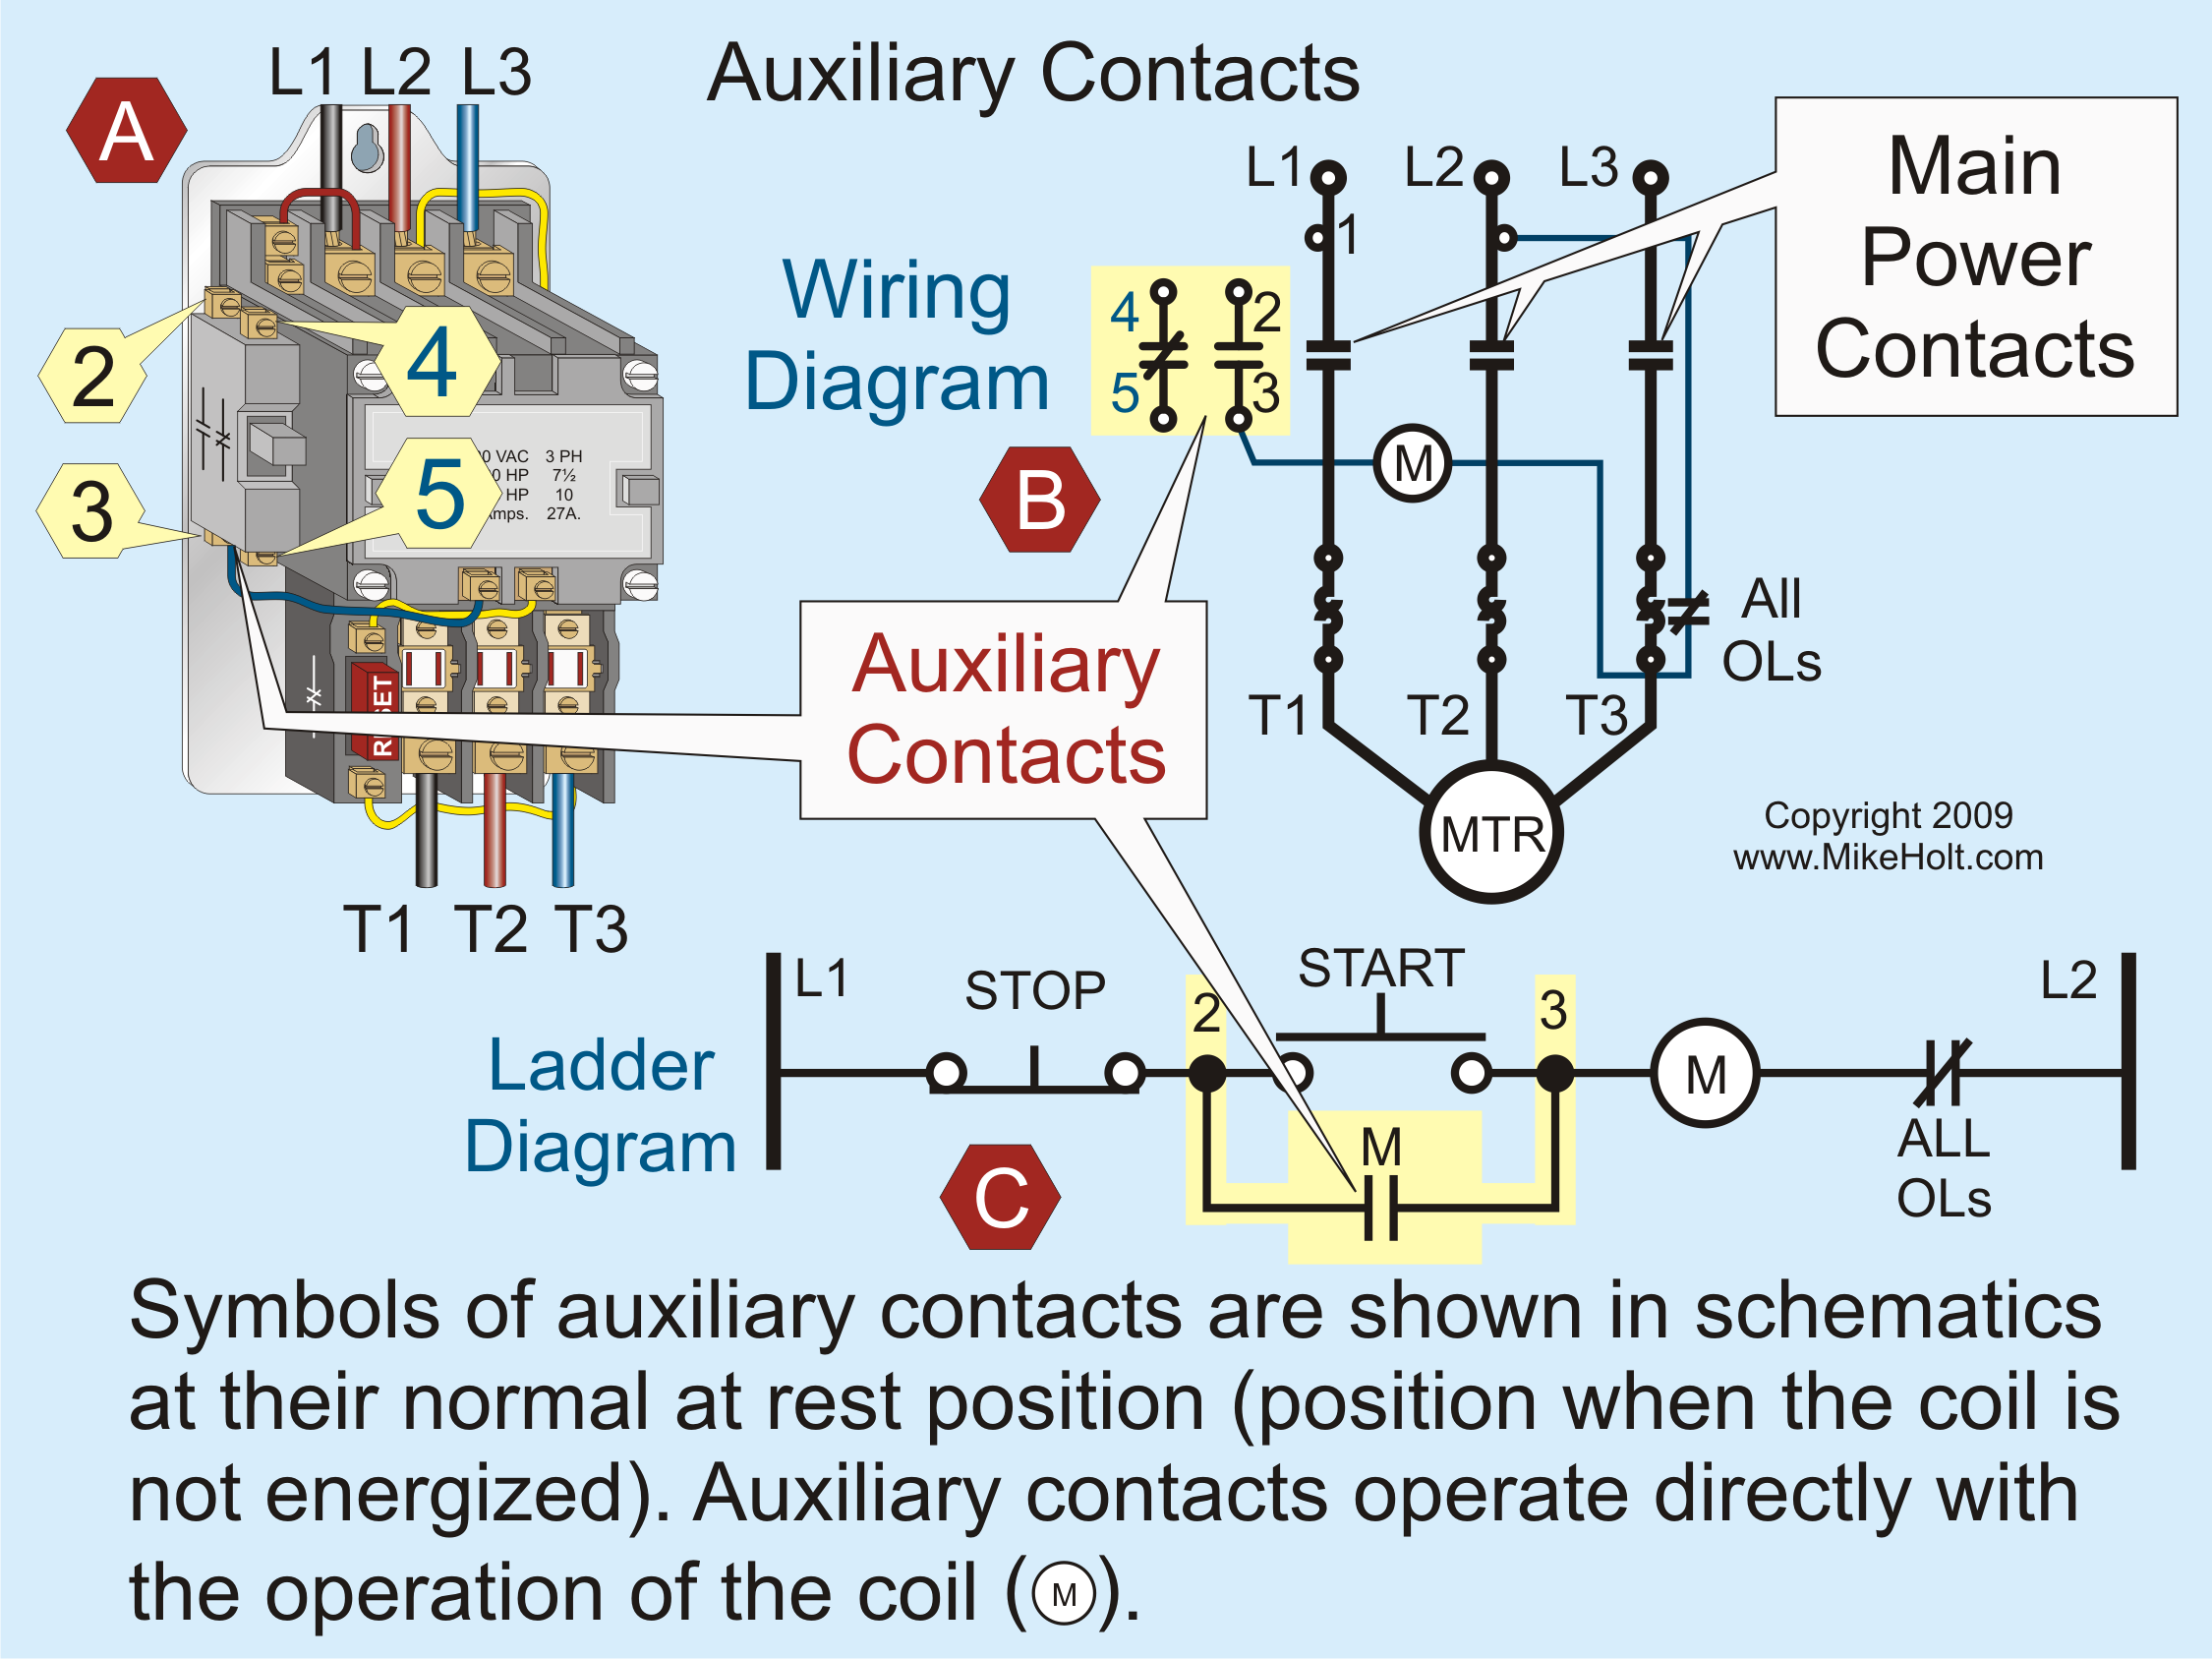 20 Luxury Jog Switch Wiring Diagram